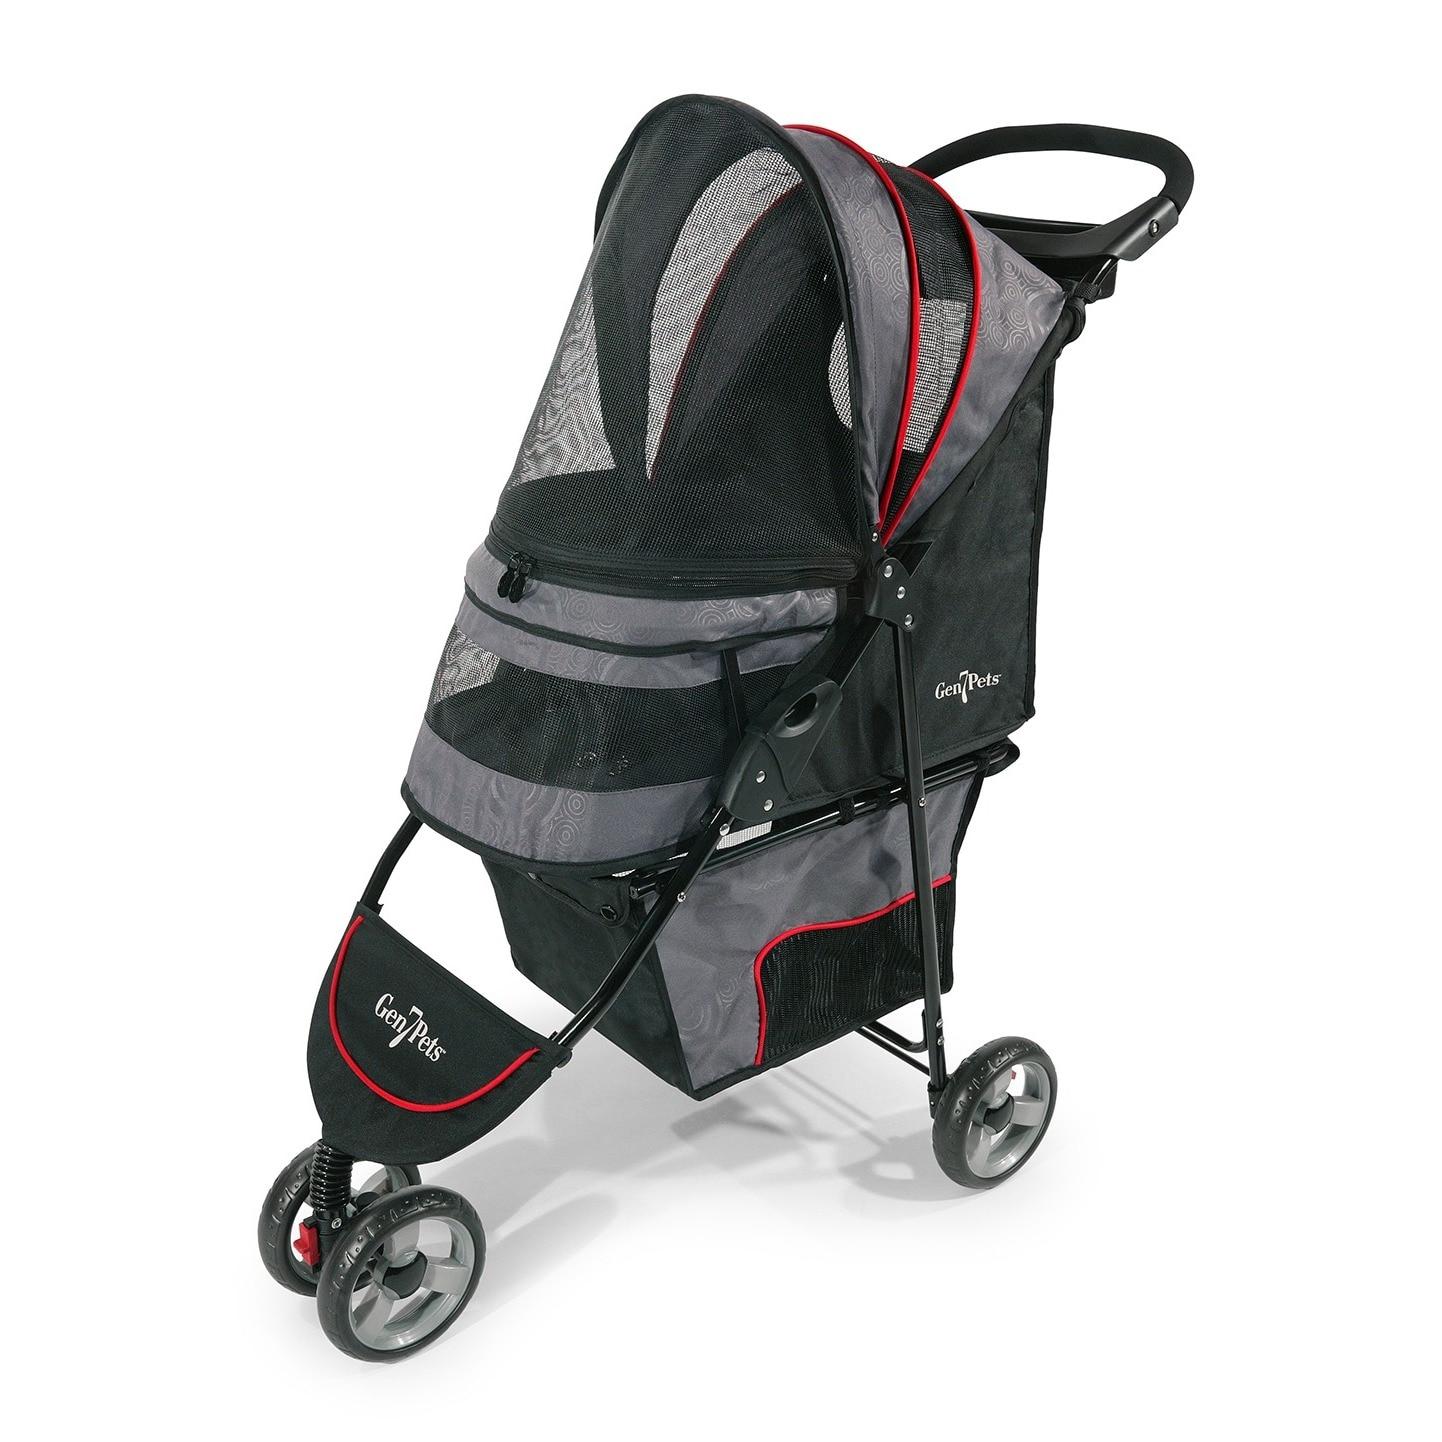 Gen7Pets Regal Pet Stroller (Gray Shadow), Grey, Size Medium